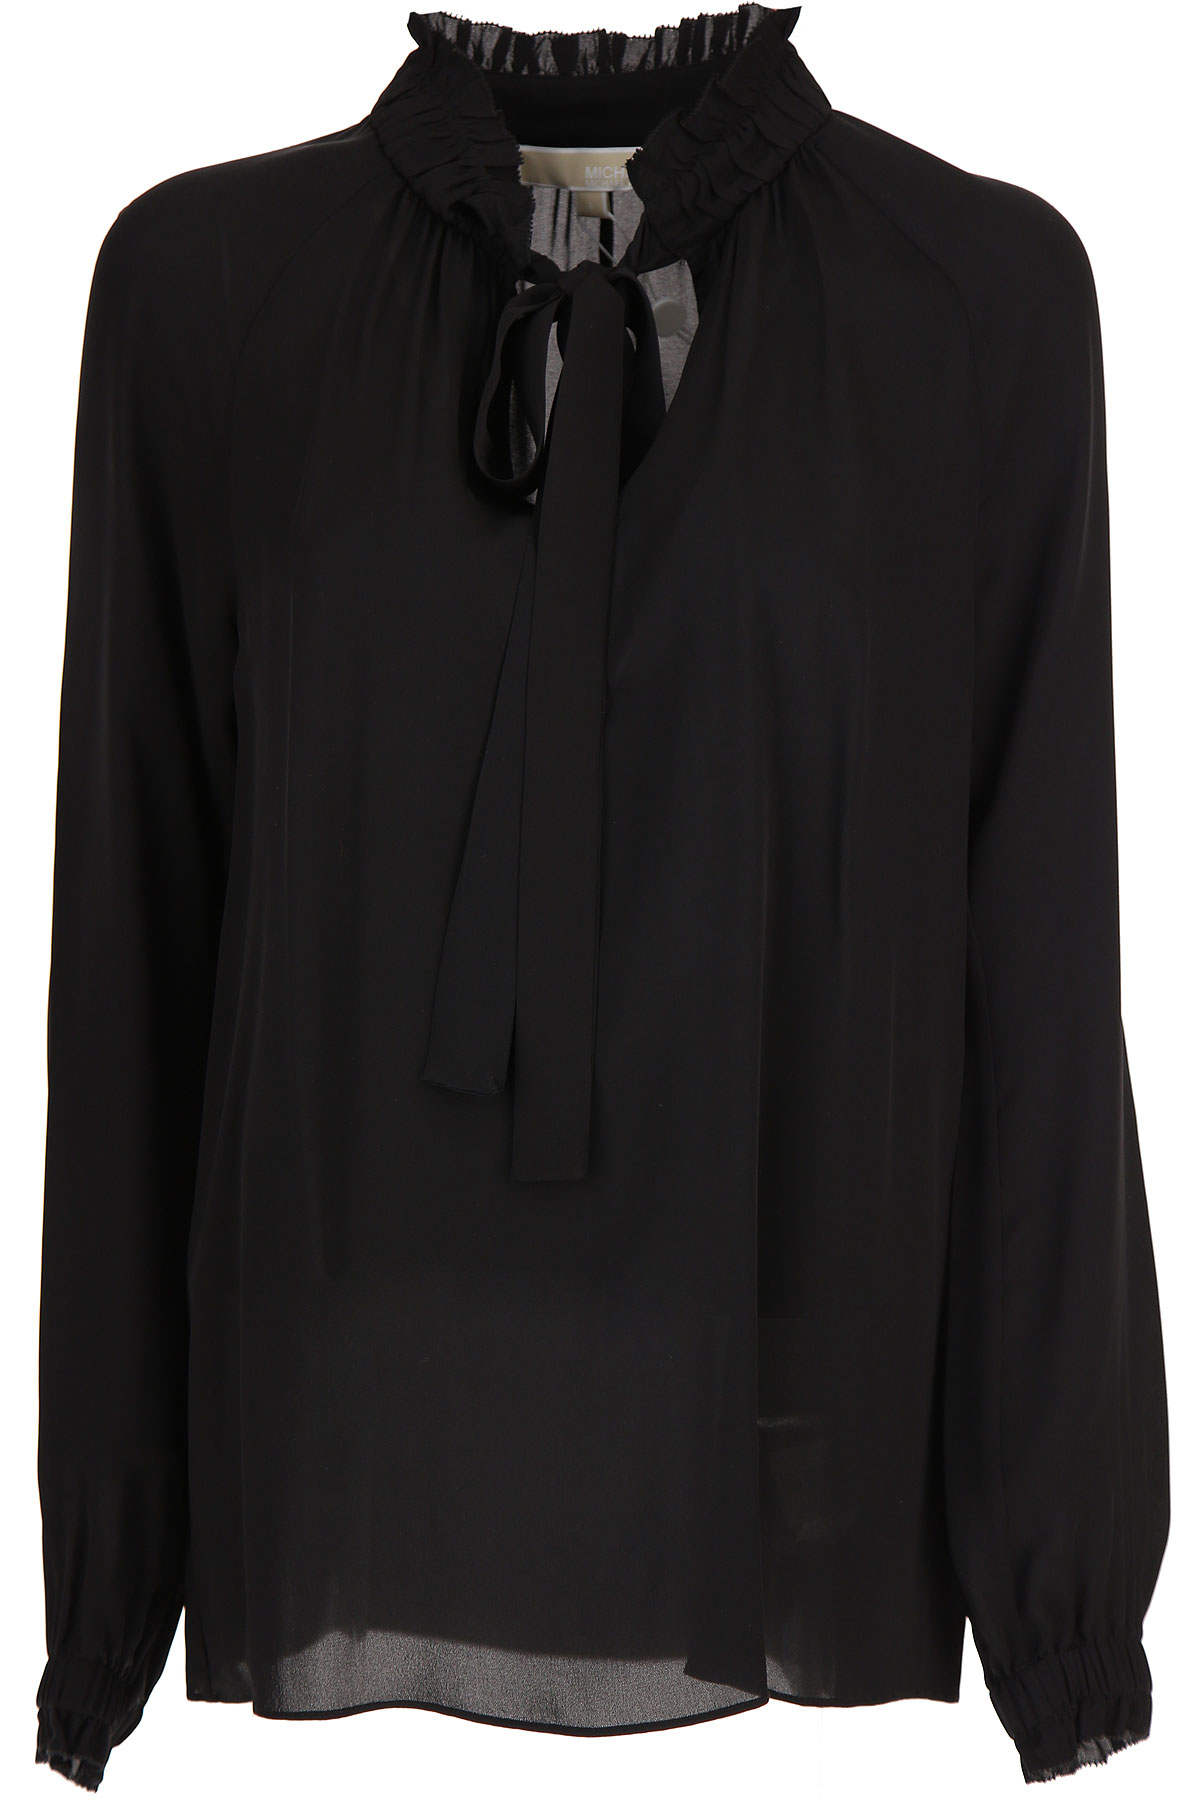 Michael Kors Top for Women On Sale, Black, Silk, 2017, 10 6 8